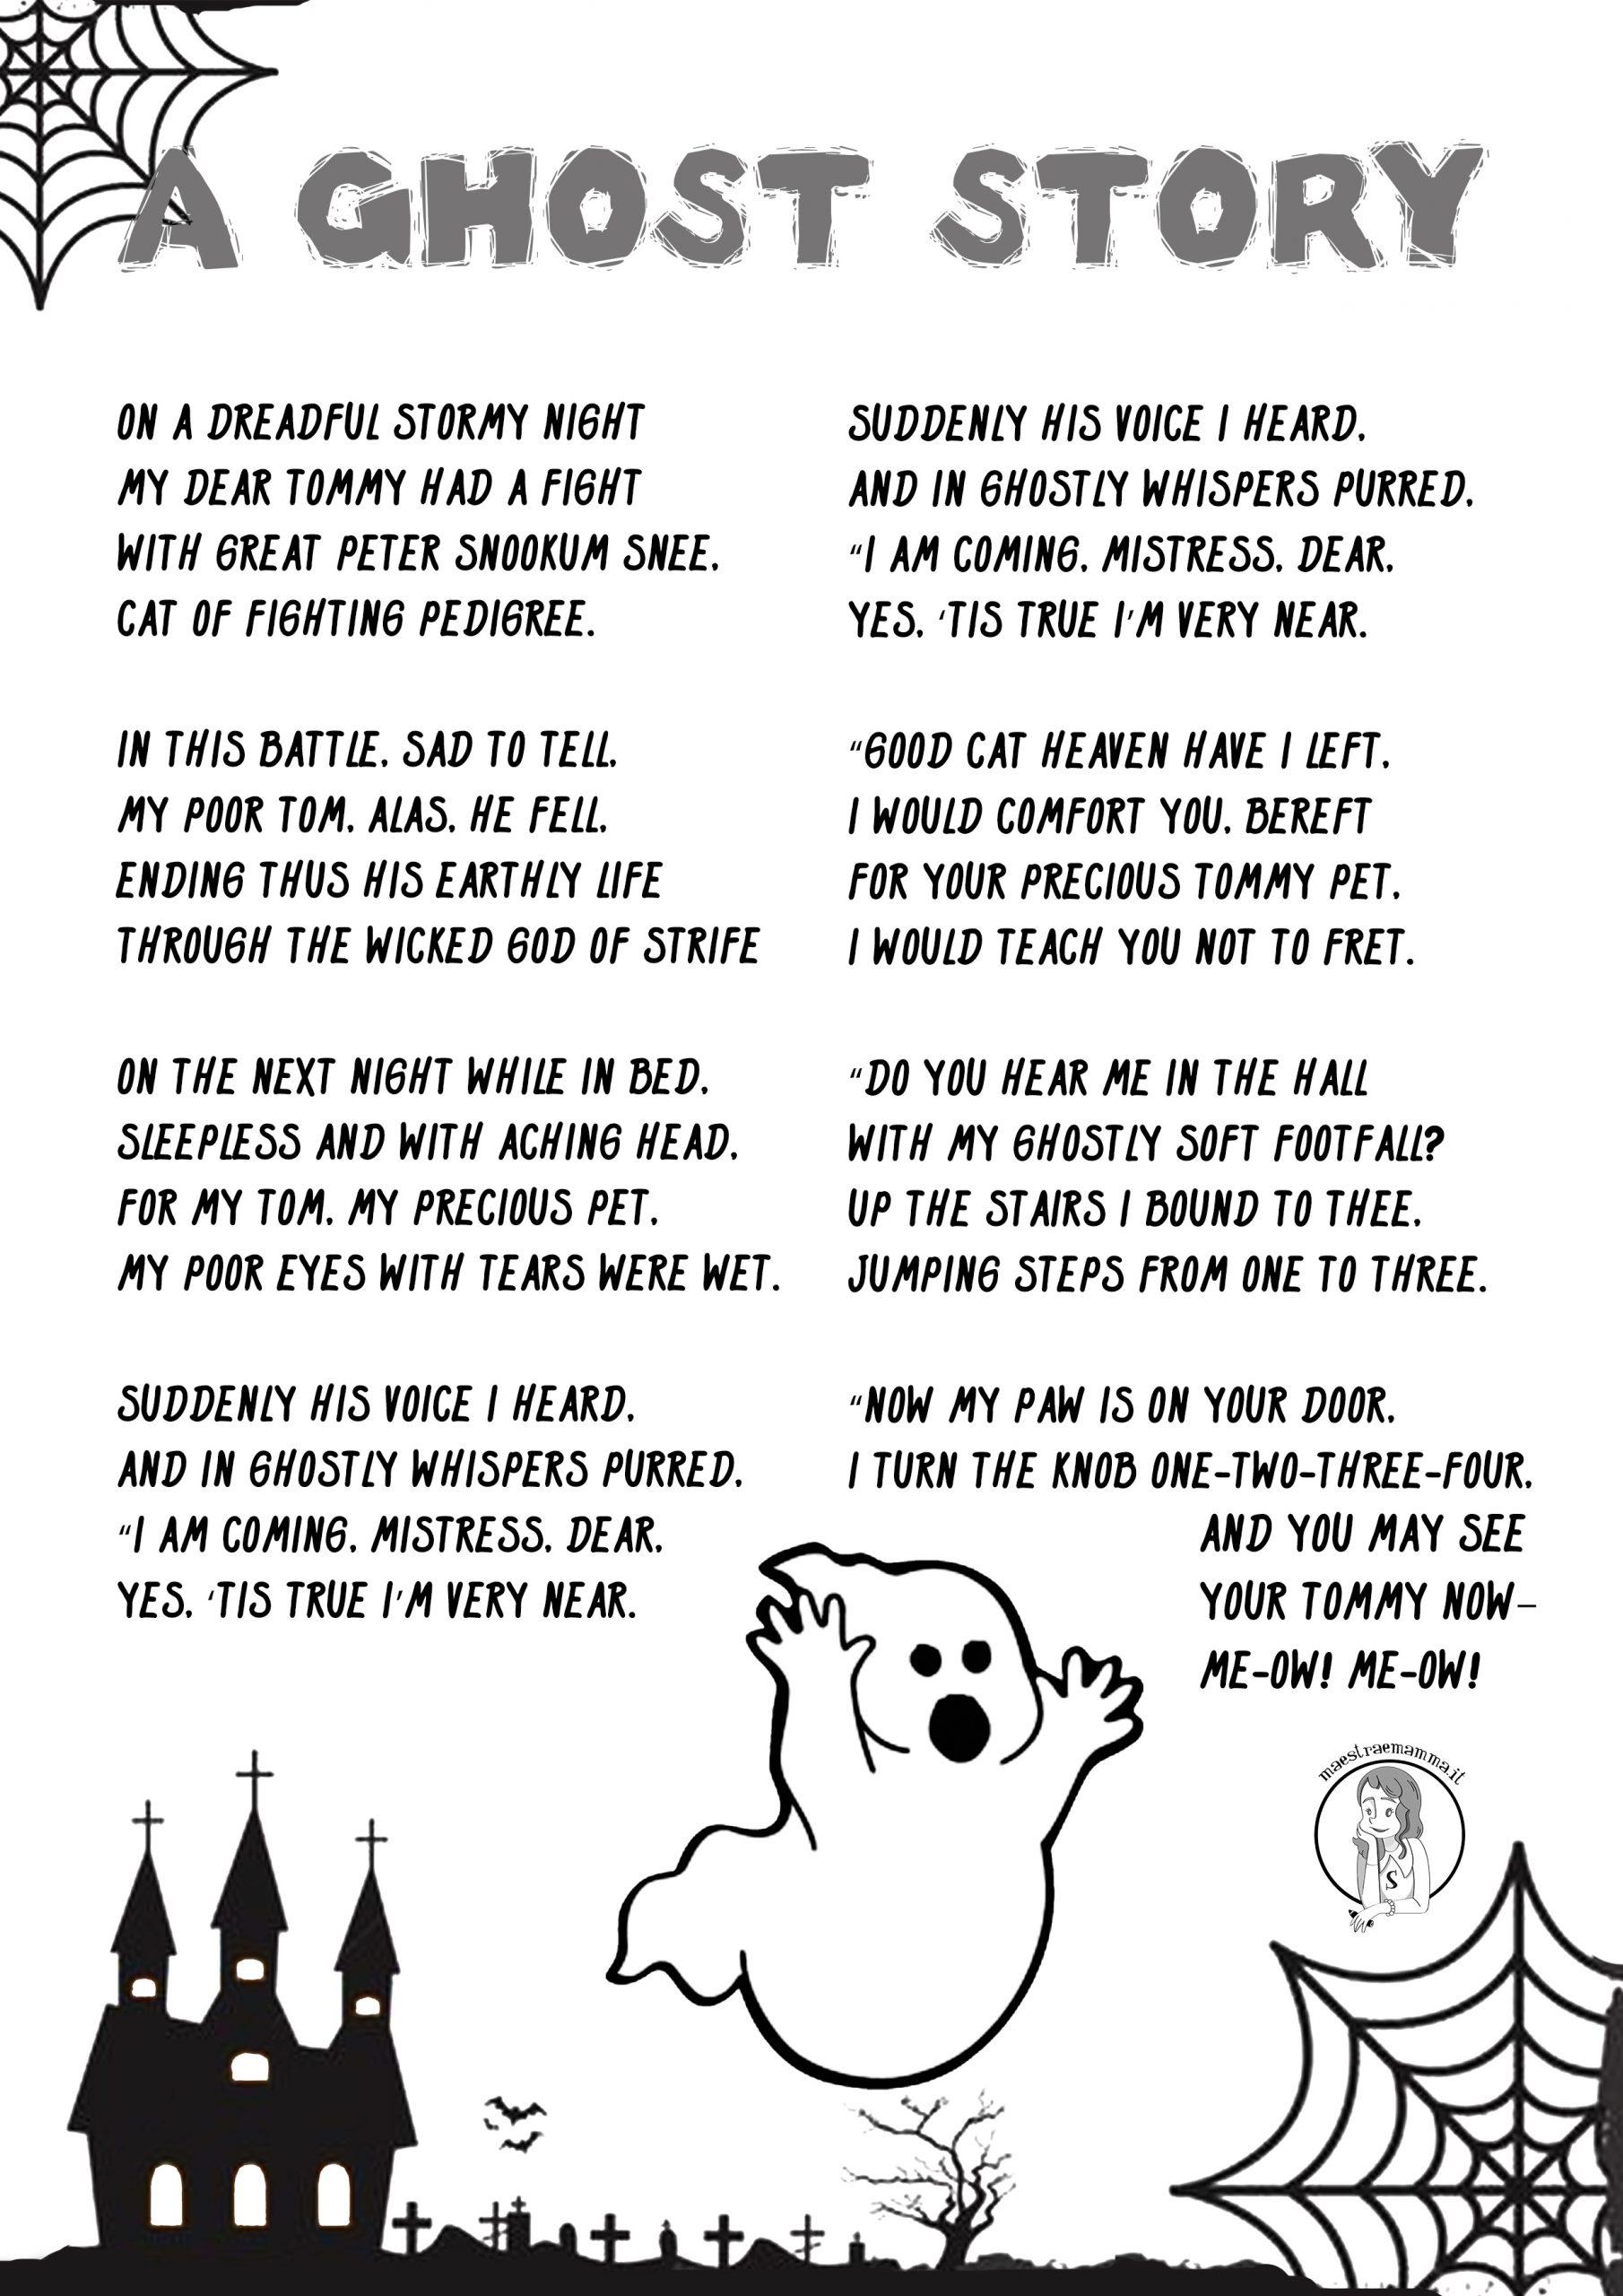 Halloween - Scary Rhymes (poesie in inglese) aghost story